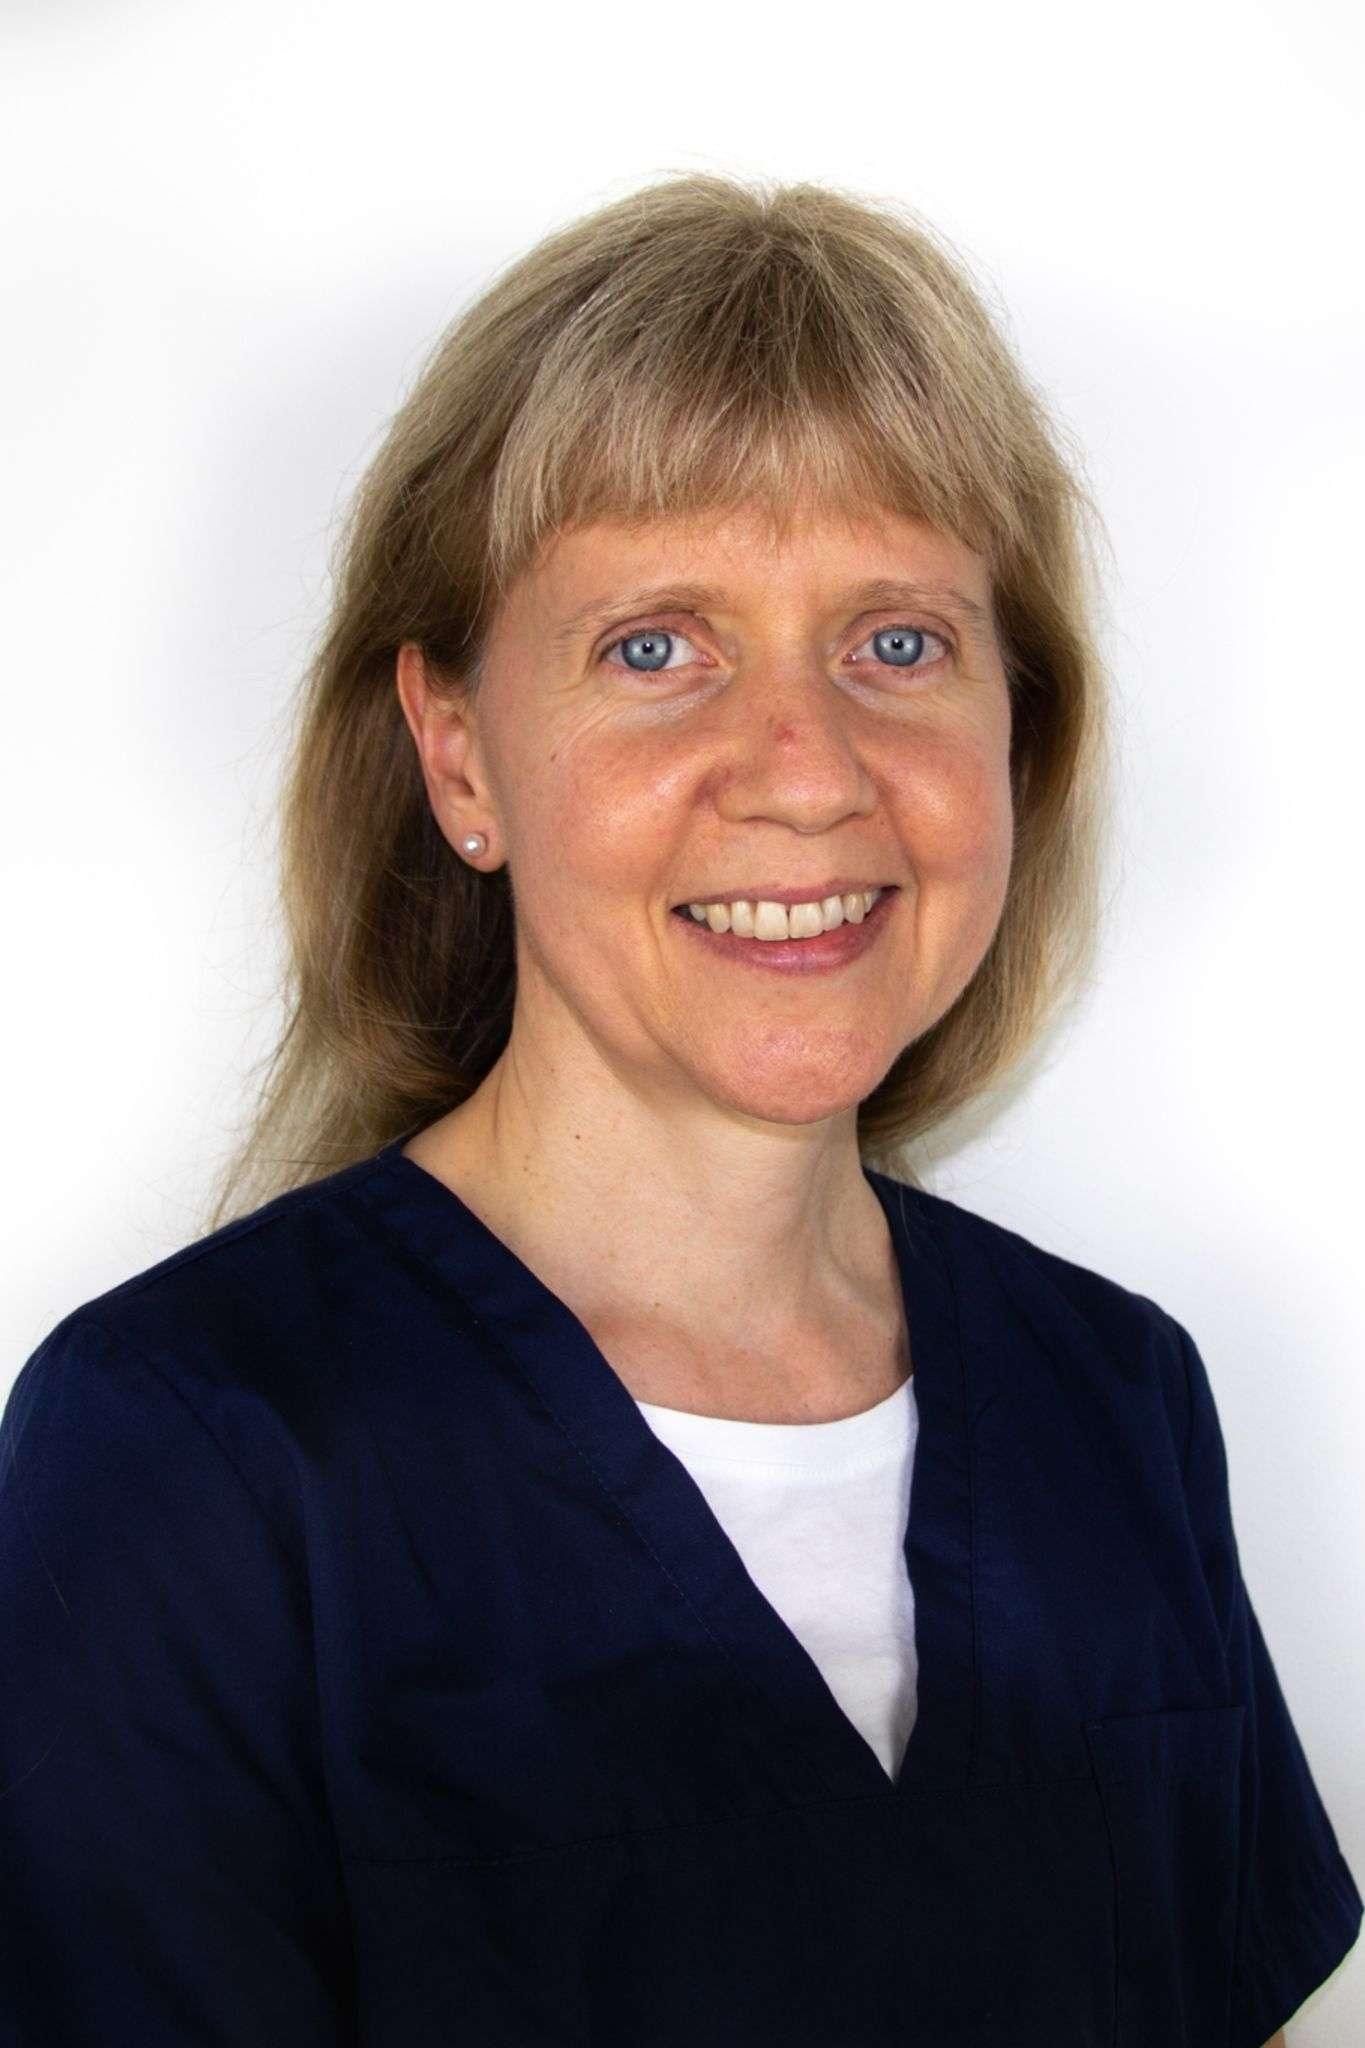 Birgit Züger